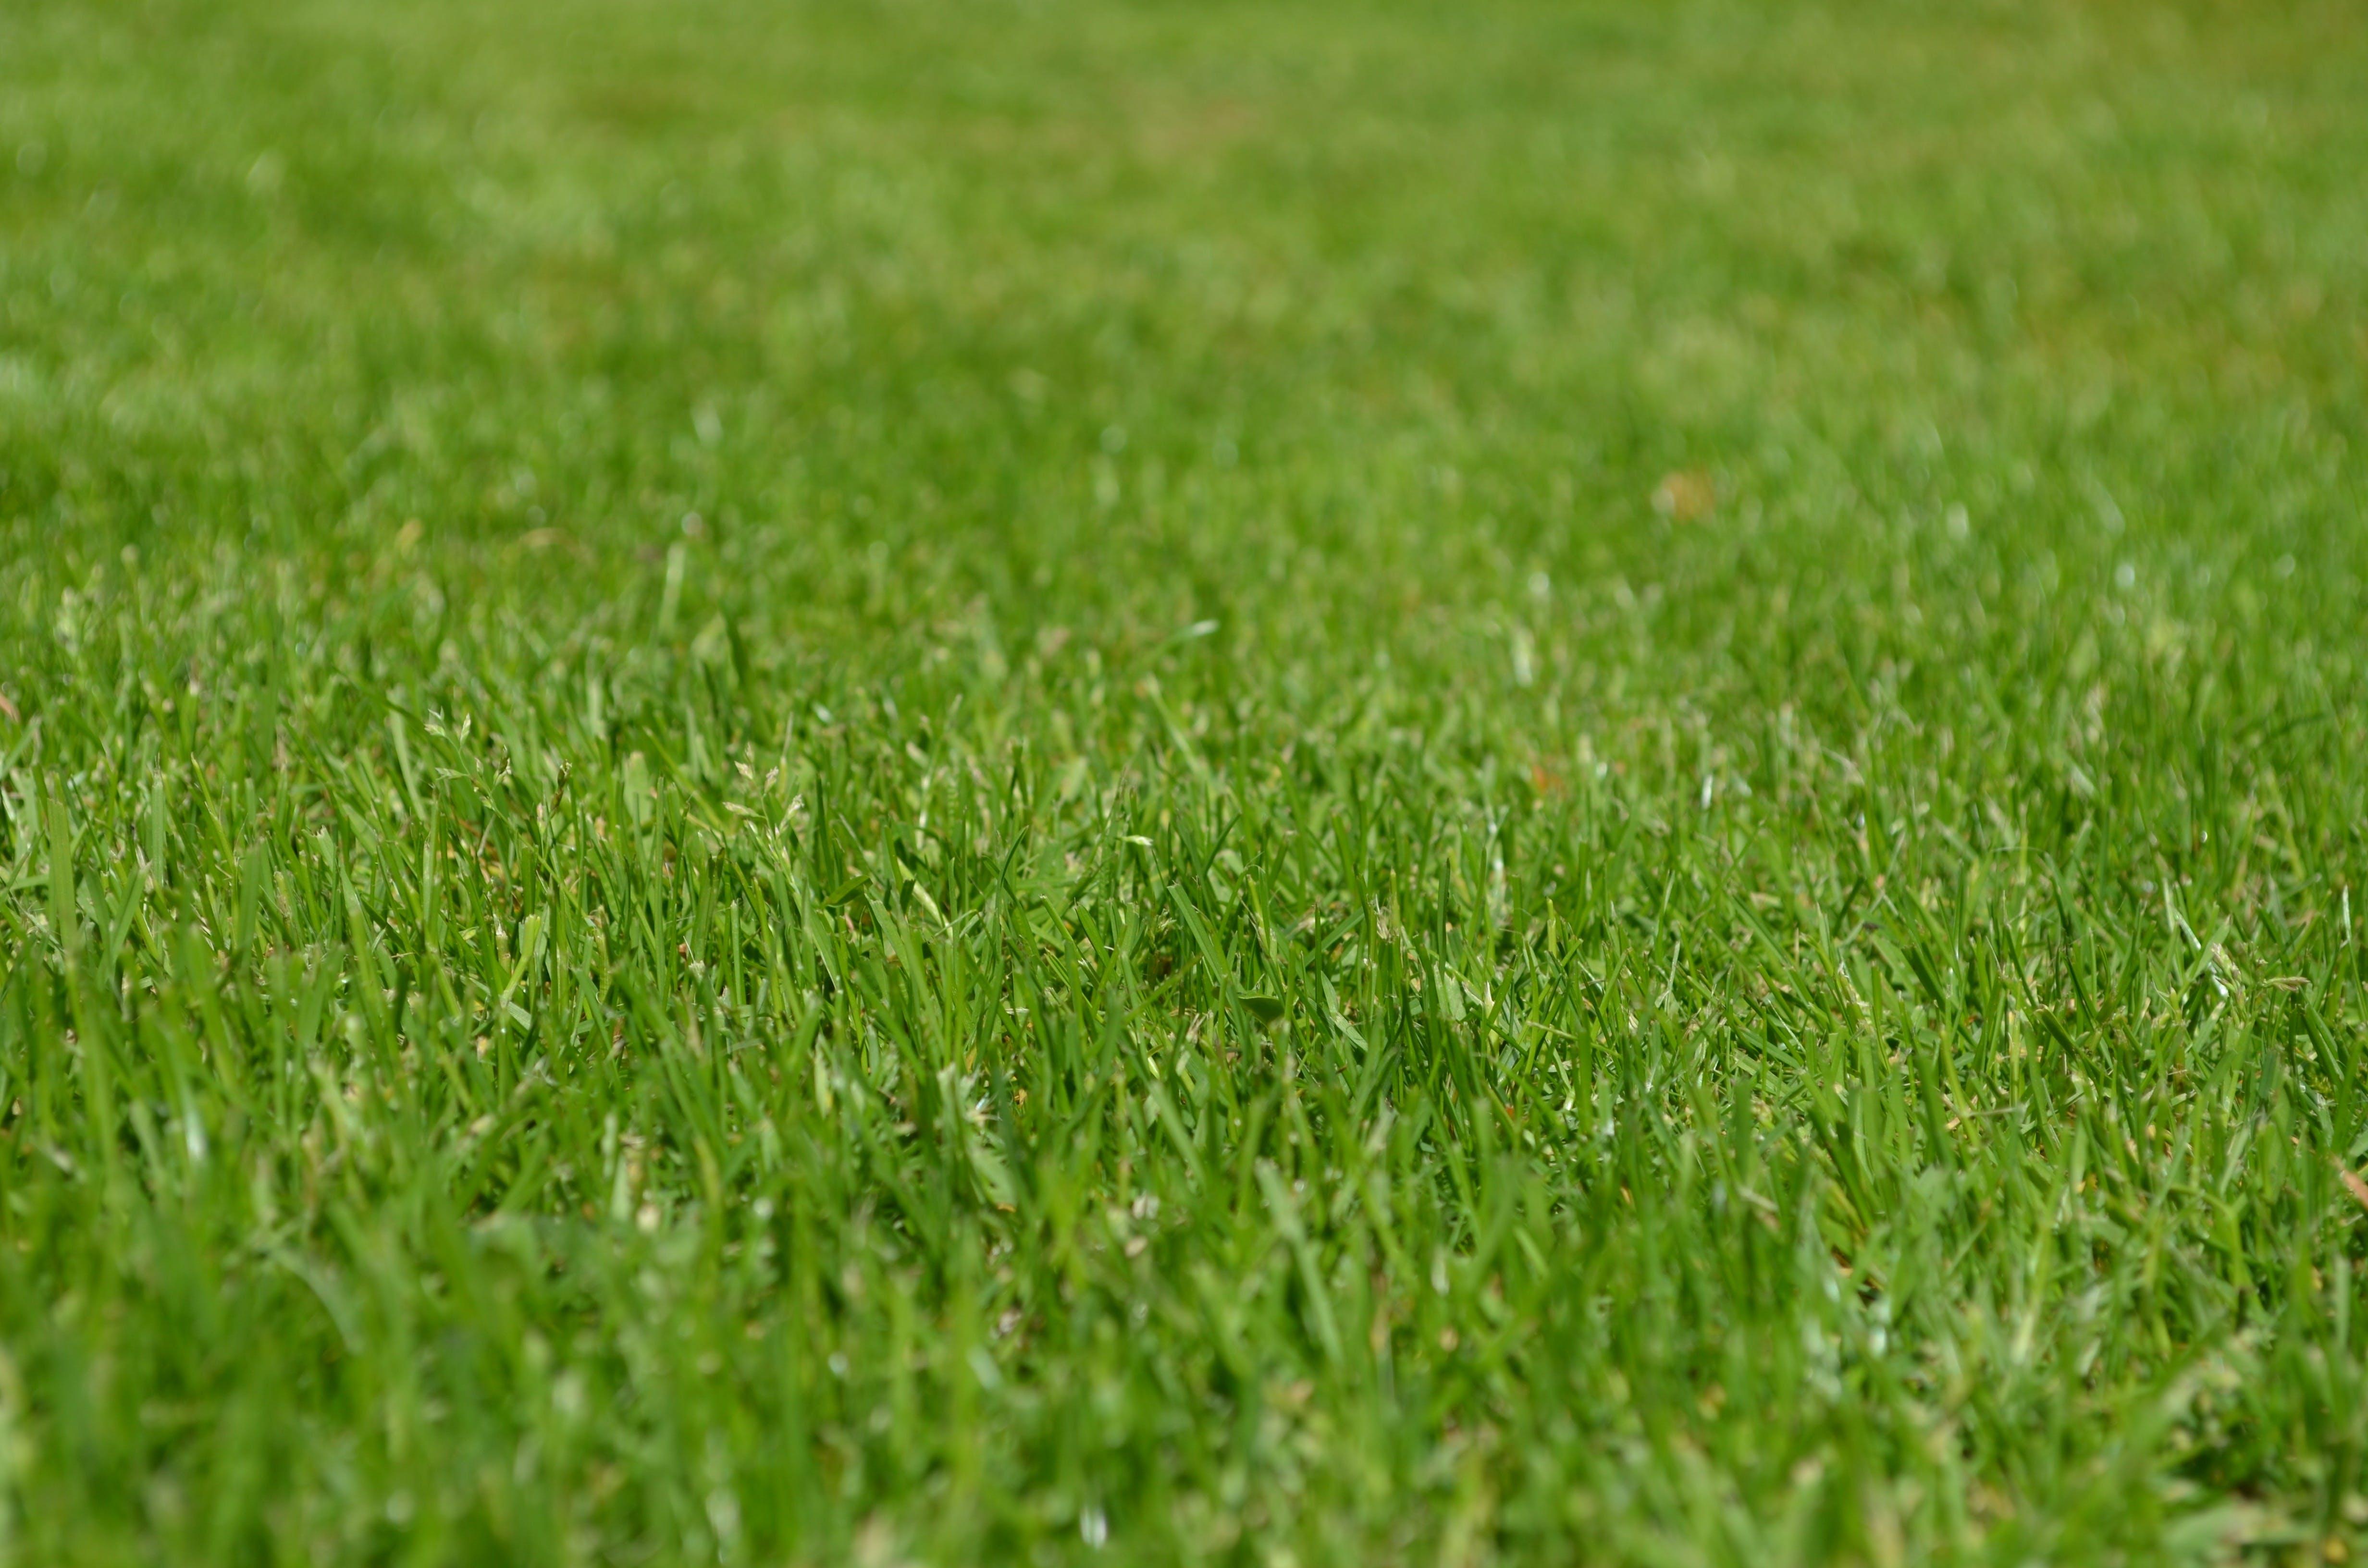 Kostenloses Stock Foto zu gras, grün, pflanze, rasen